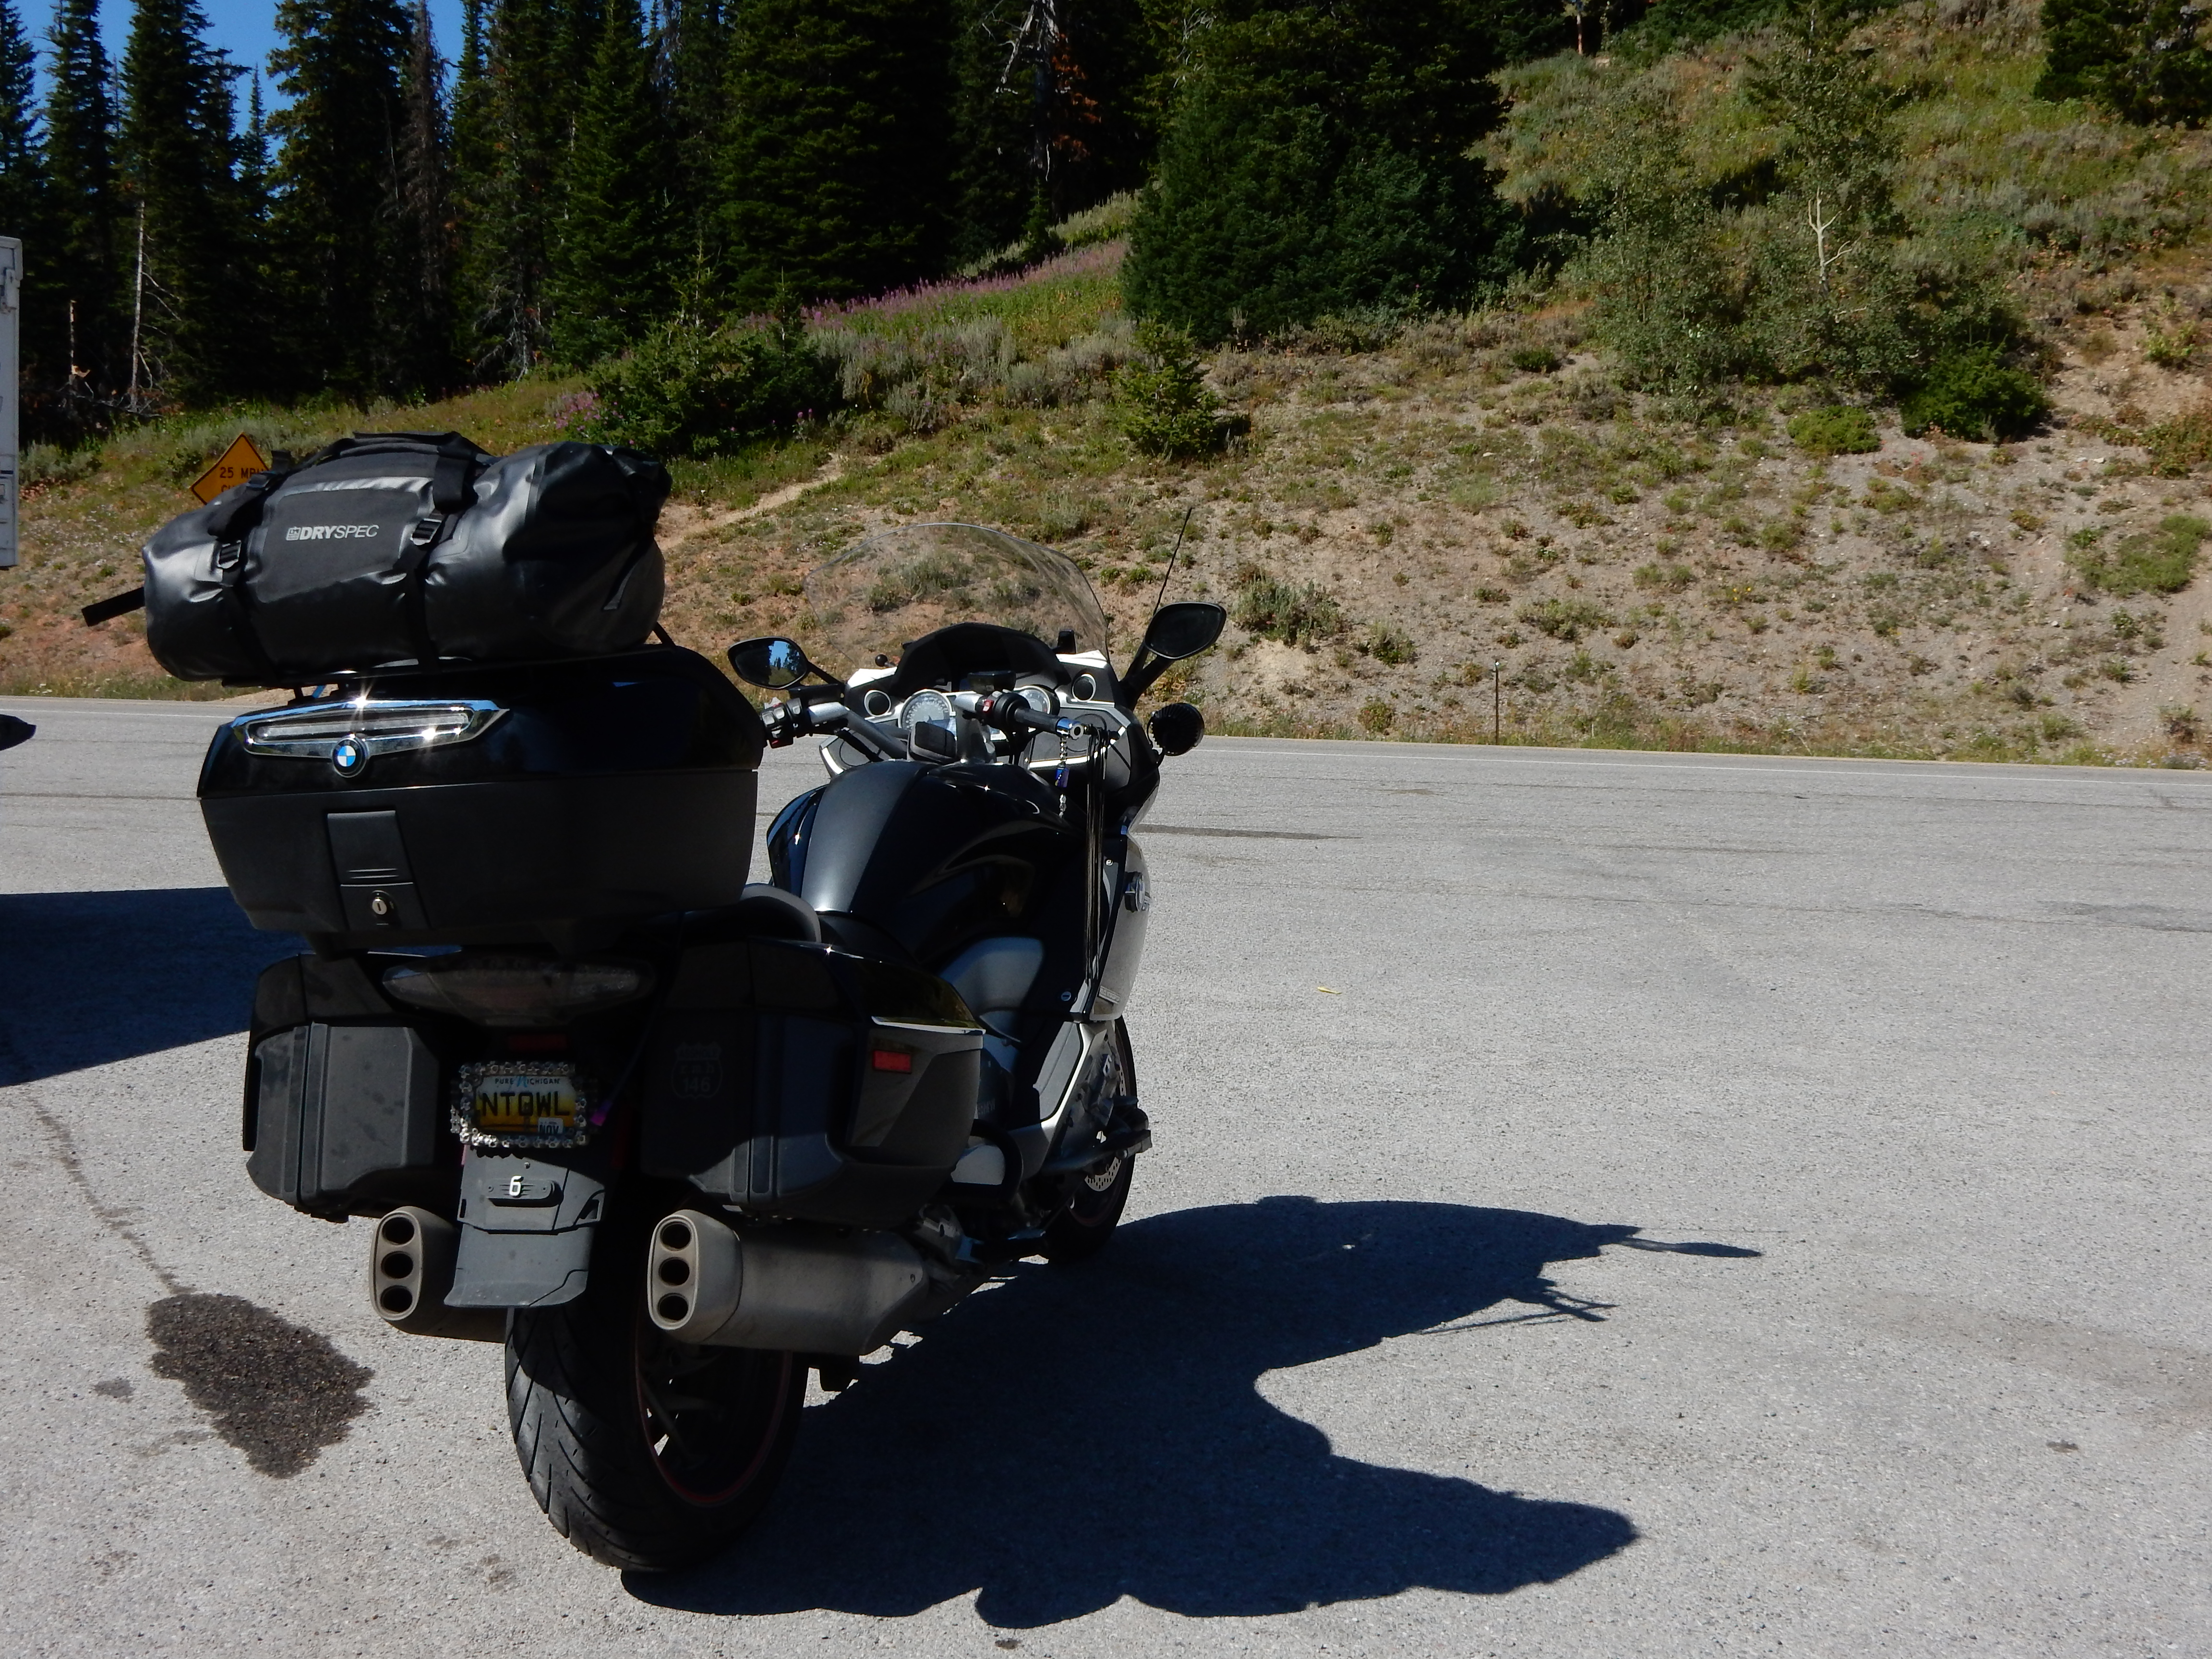 The Nightowl at Teton Pass.